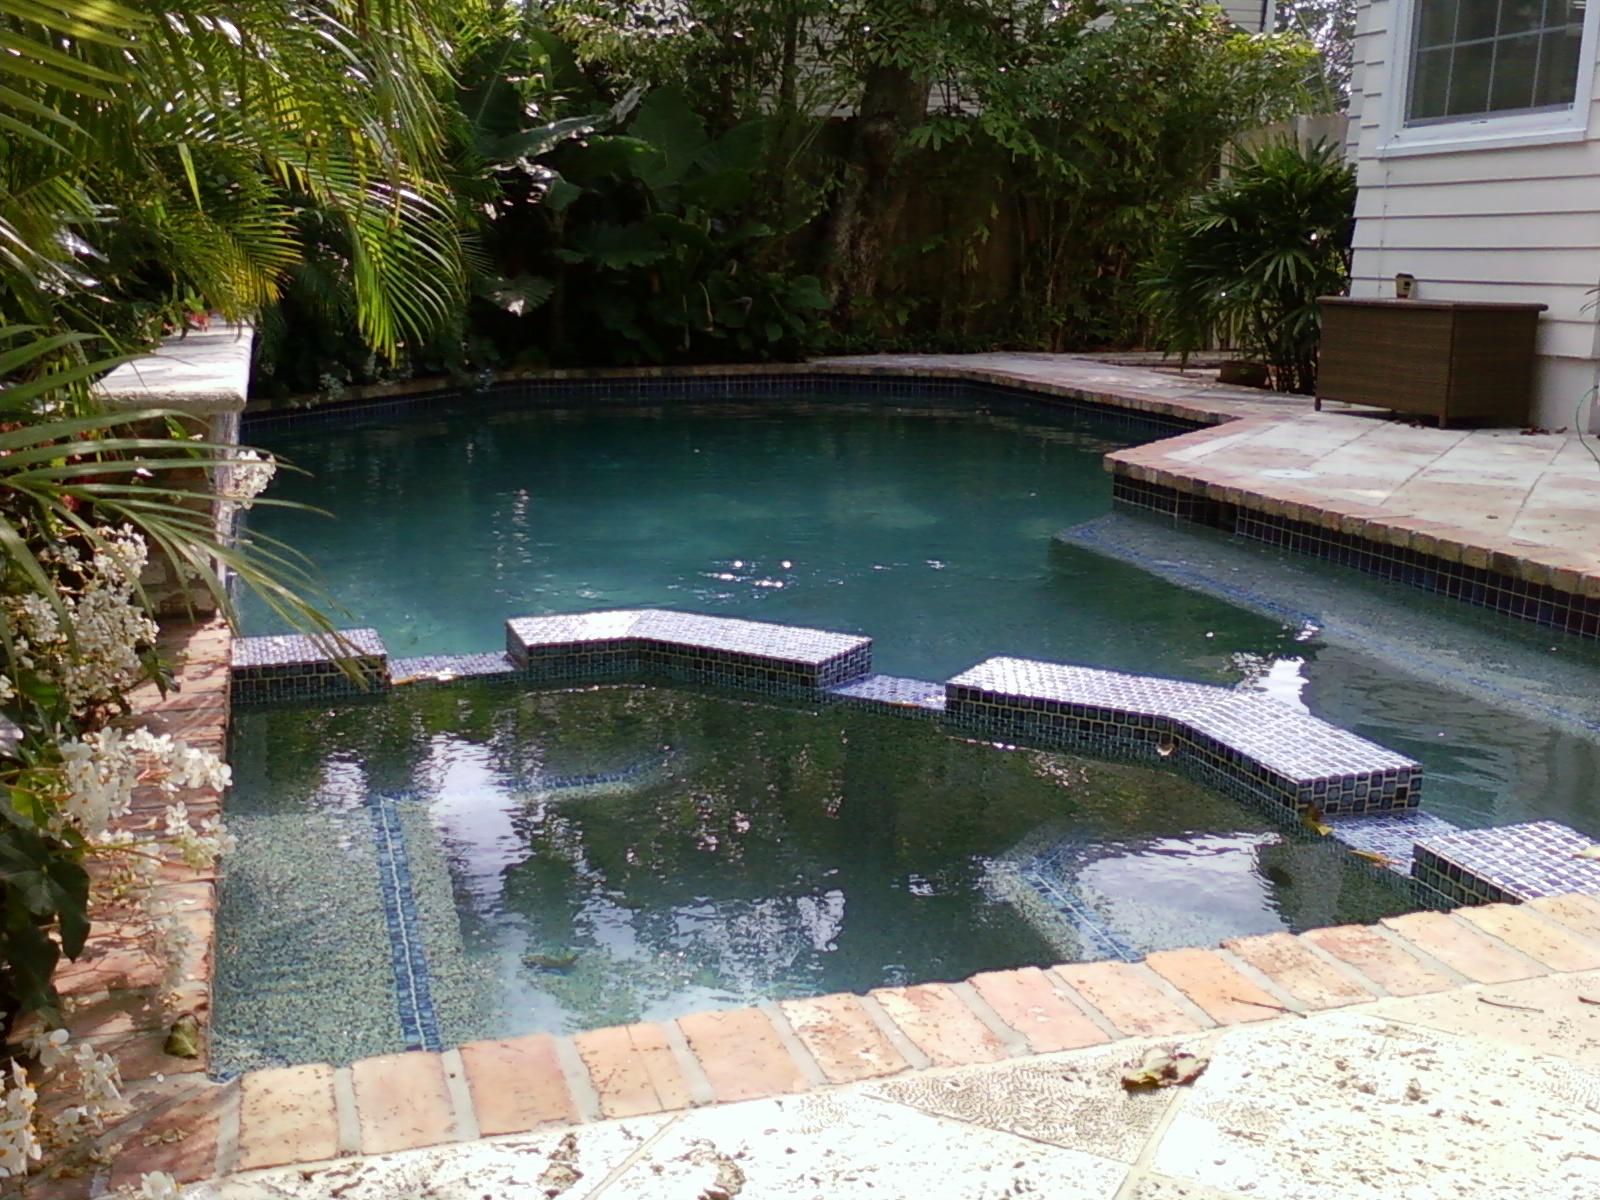 West Palm Pool Spa - 03.jpg